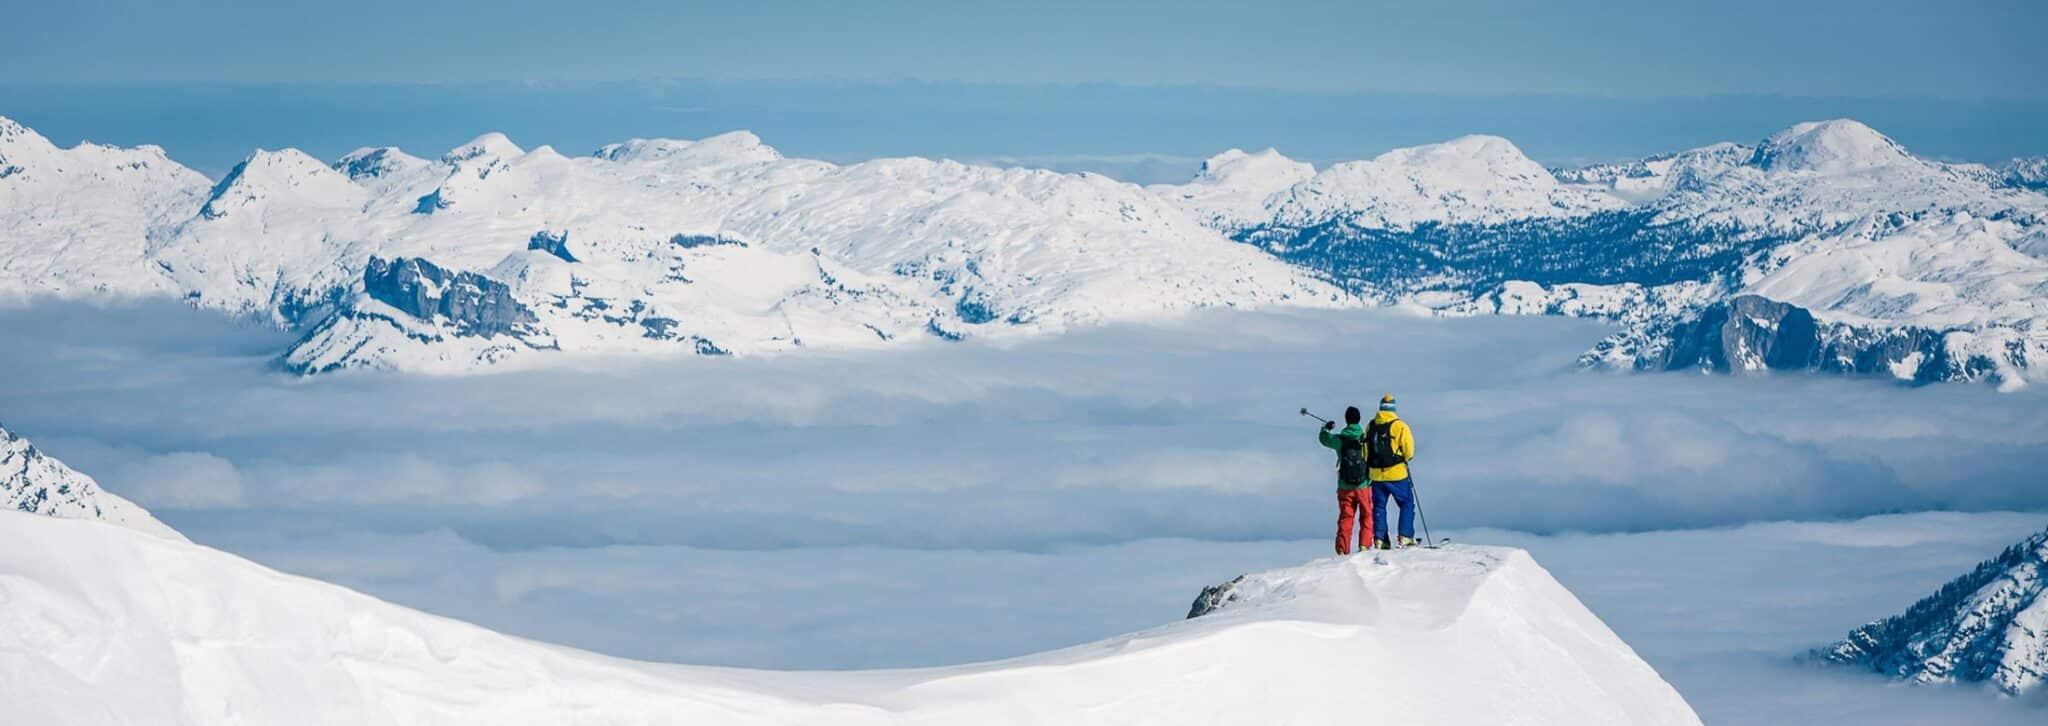 Skitour Ramsau am Dachstein